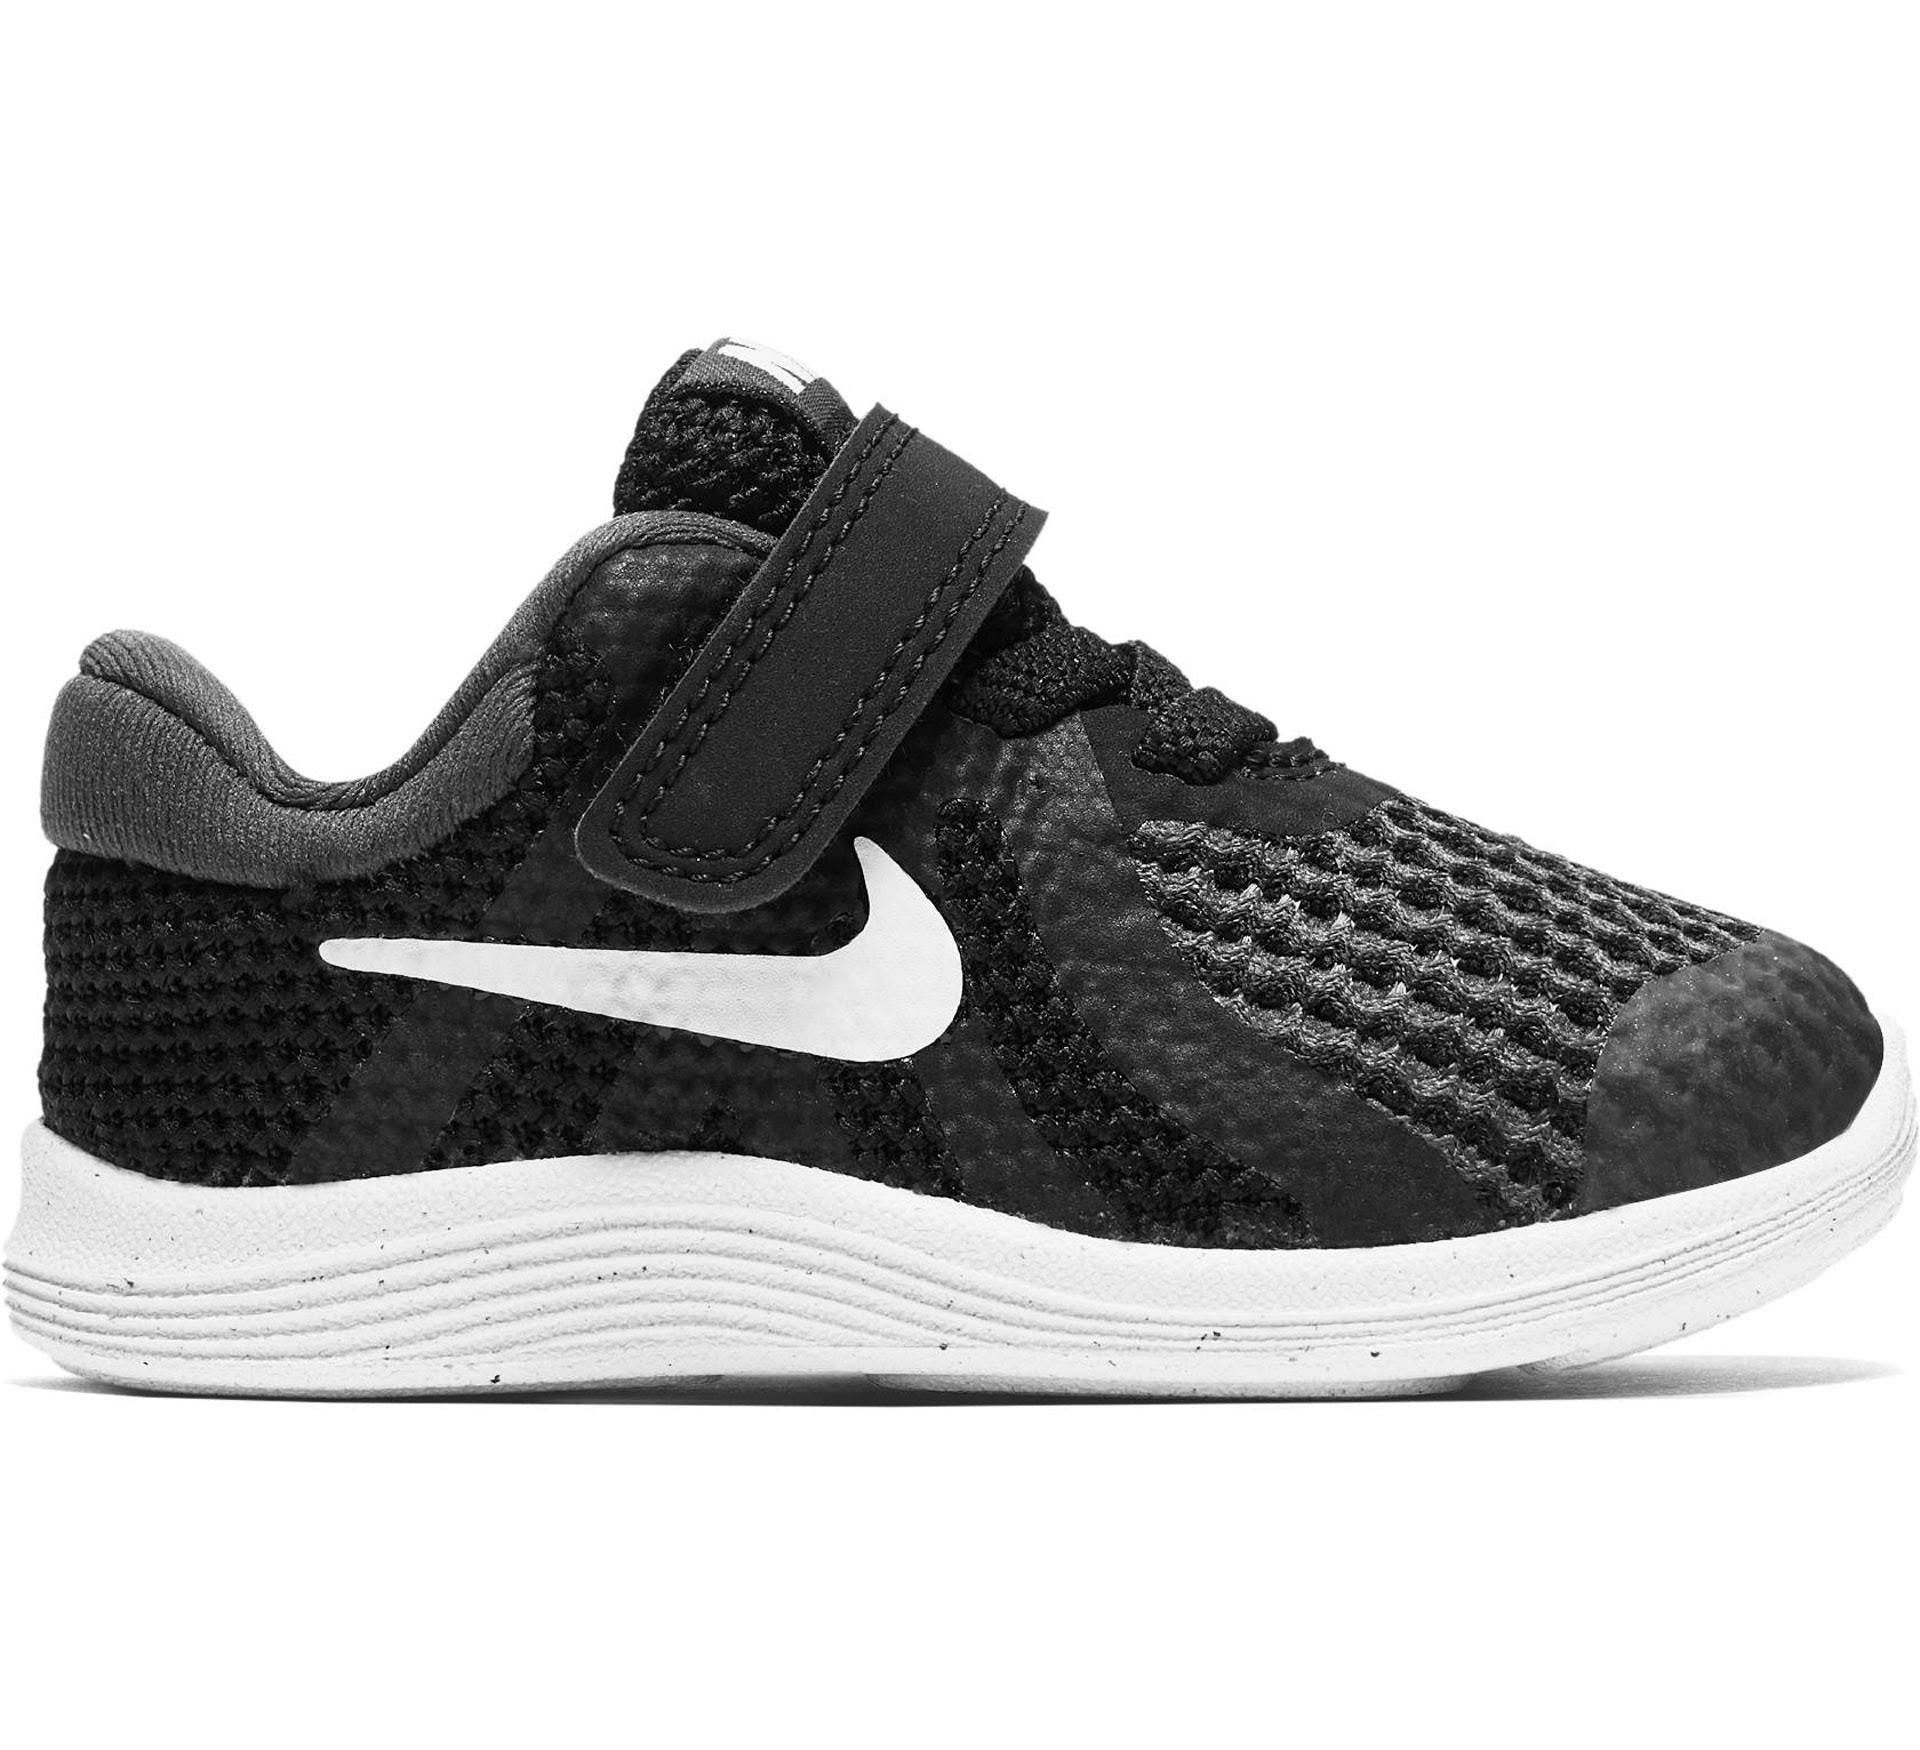 Revolution Sneaker 100793 943304 Kinderschuhe anthrazit Nike 4 Schwarz 006 Gr xFCwA4vEq